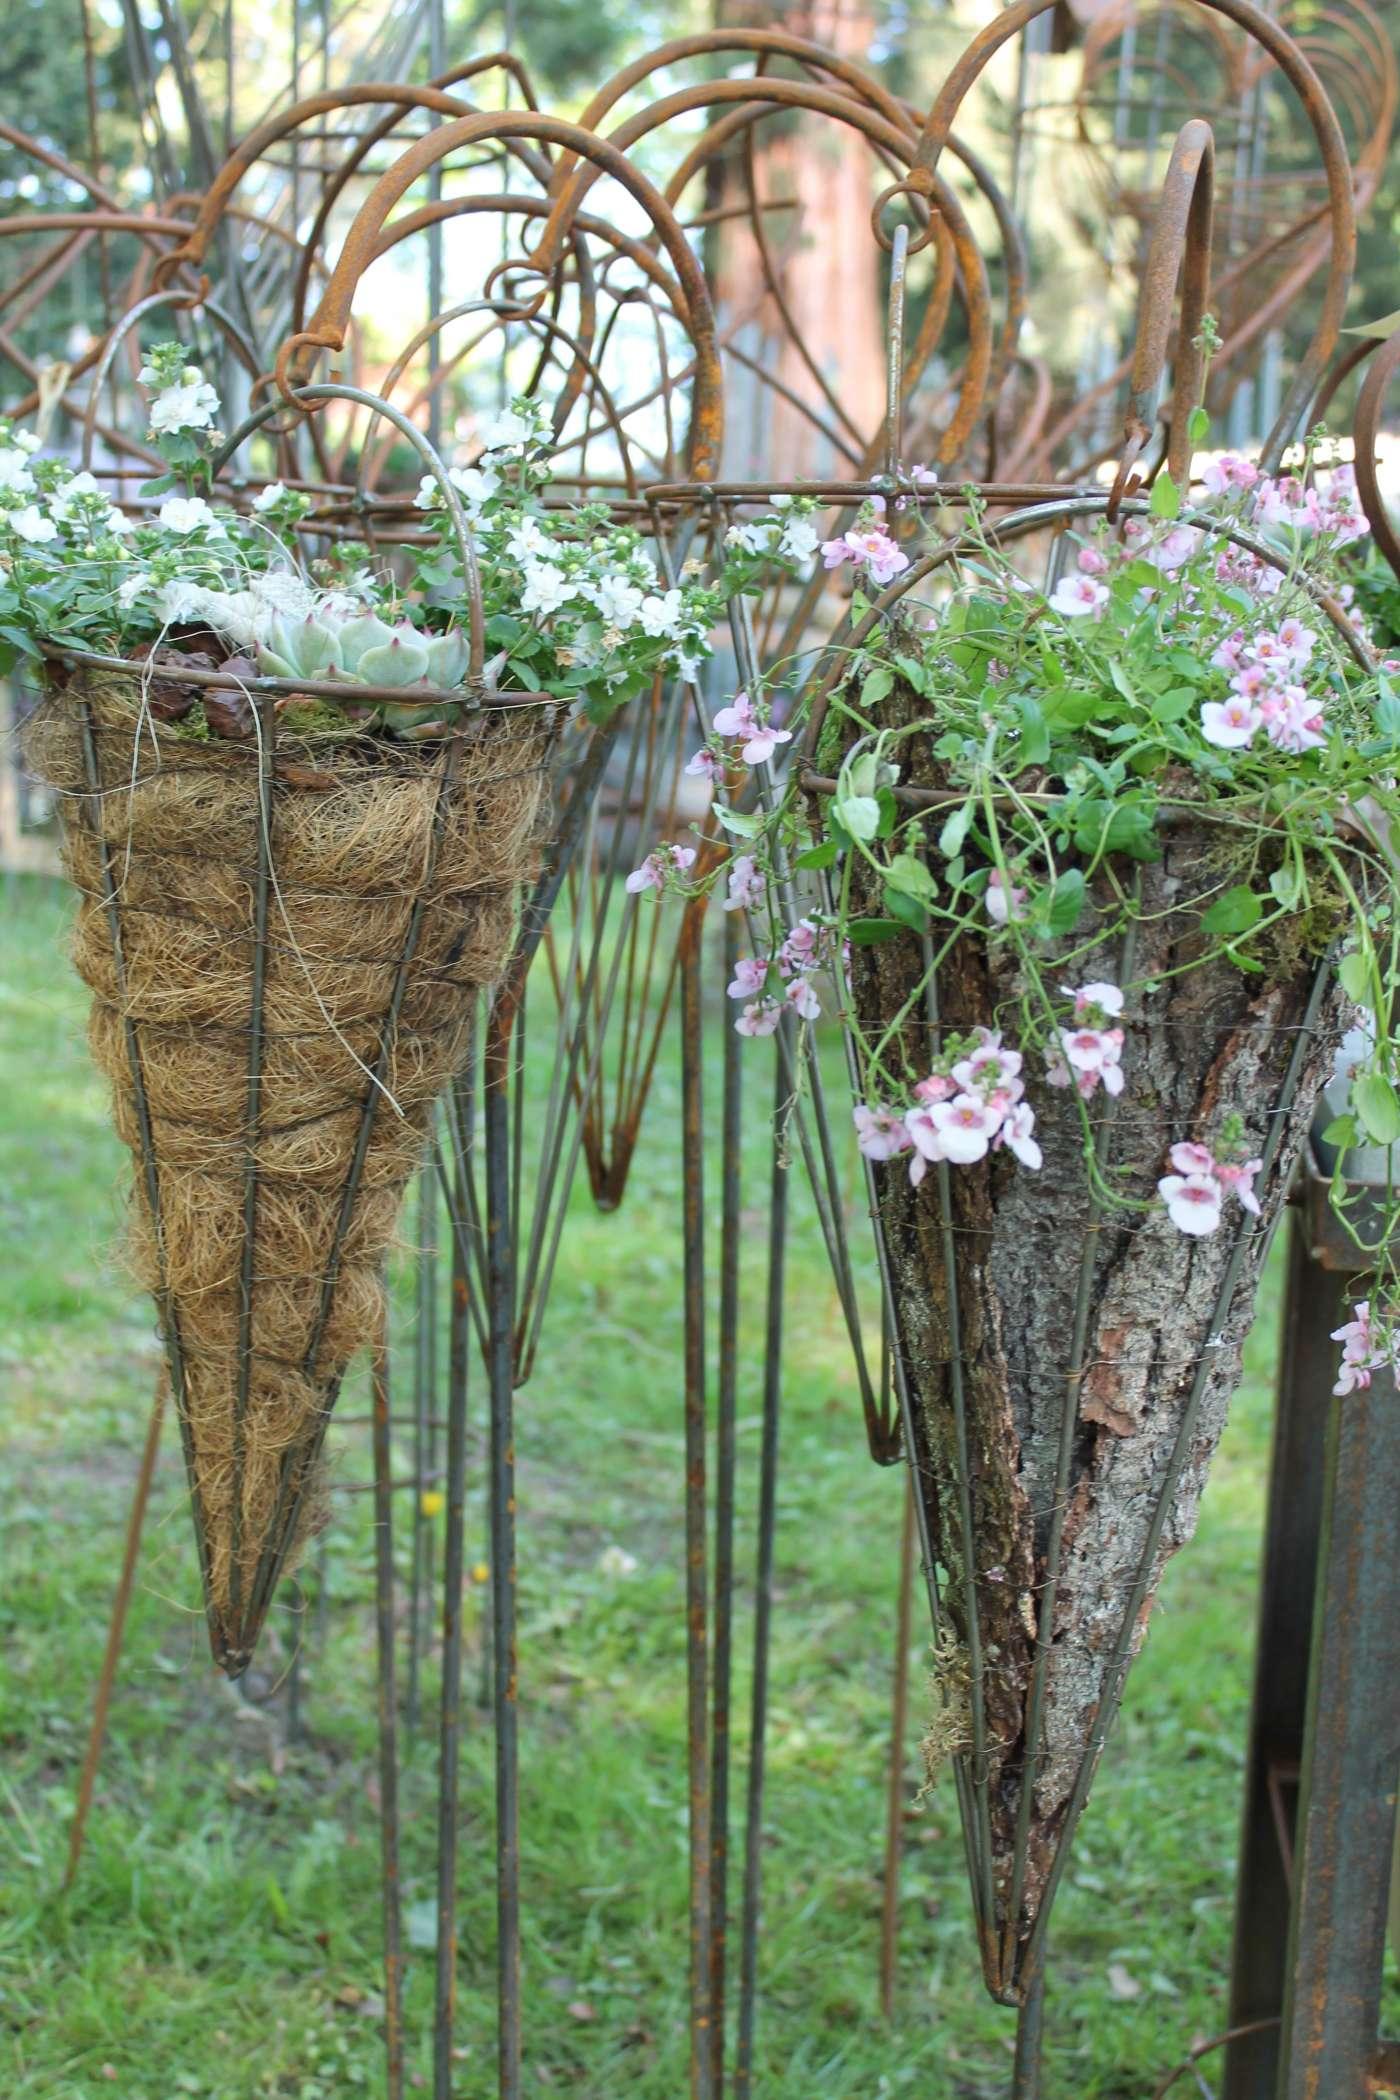 jern i haven